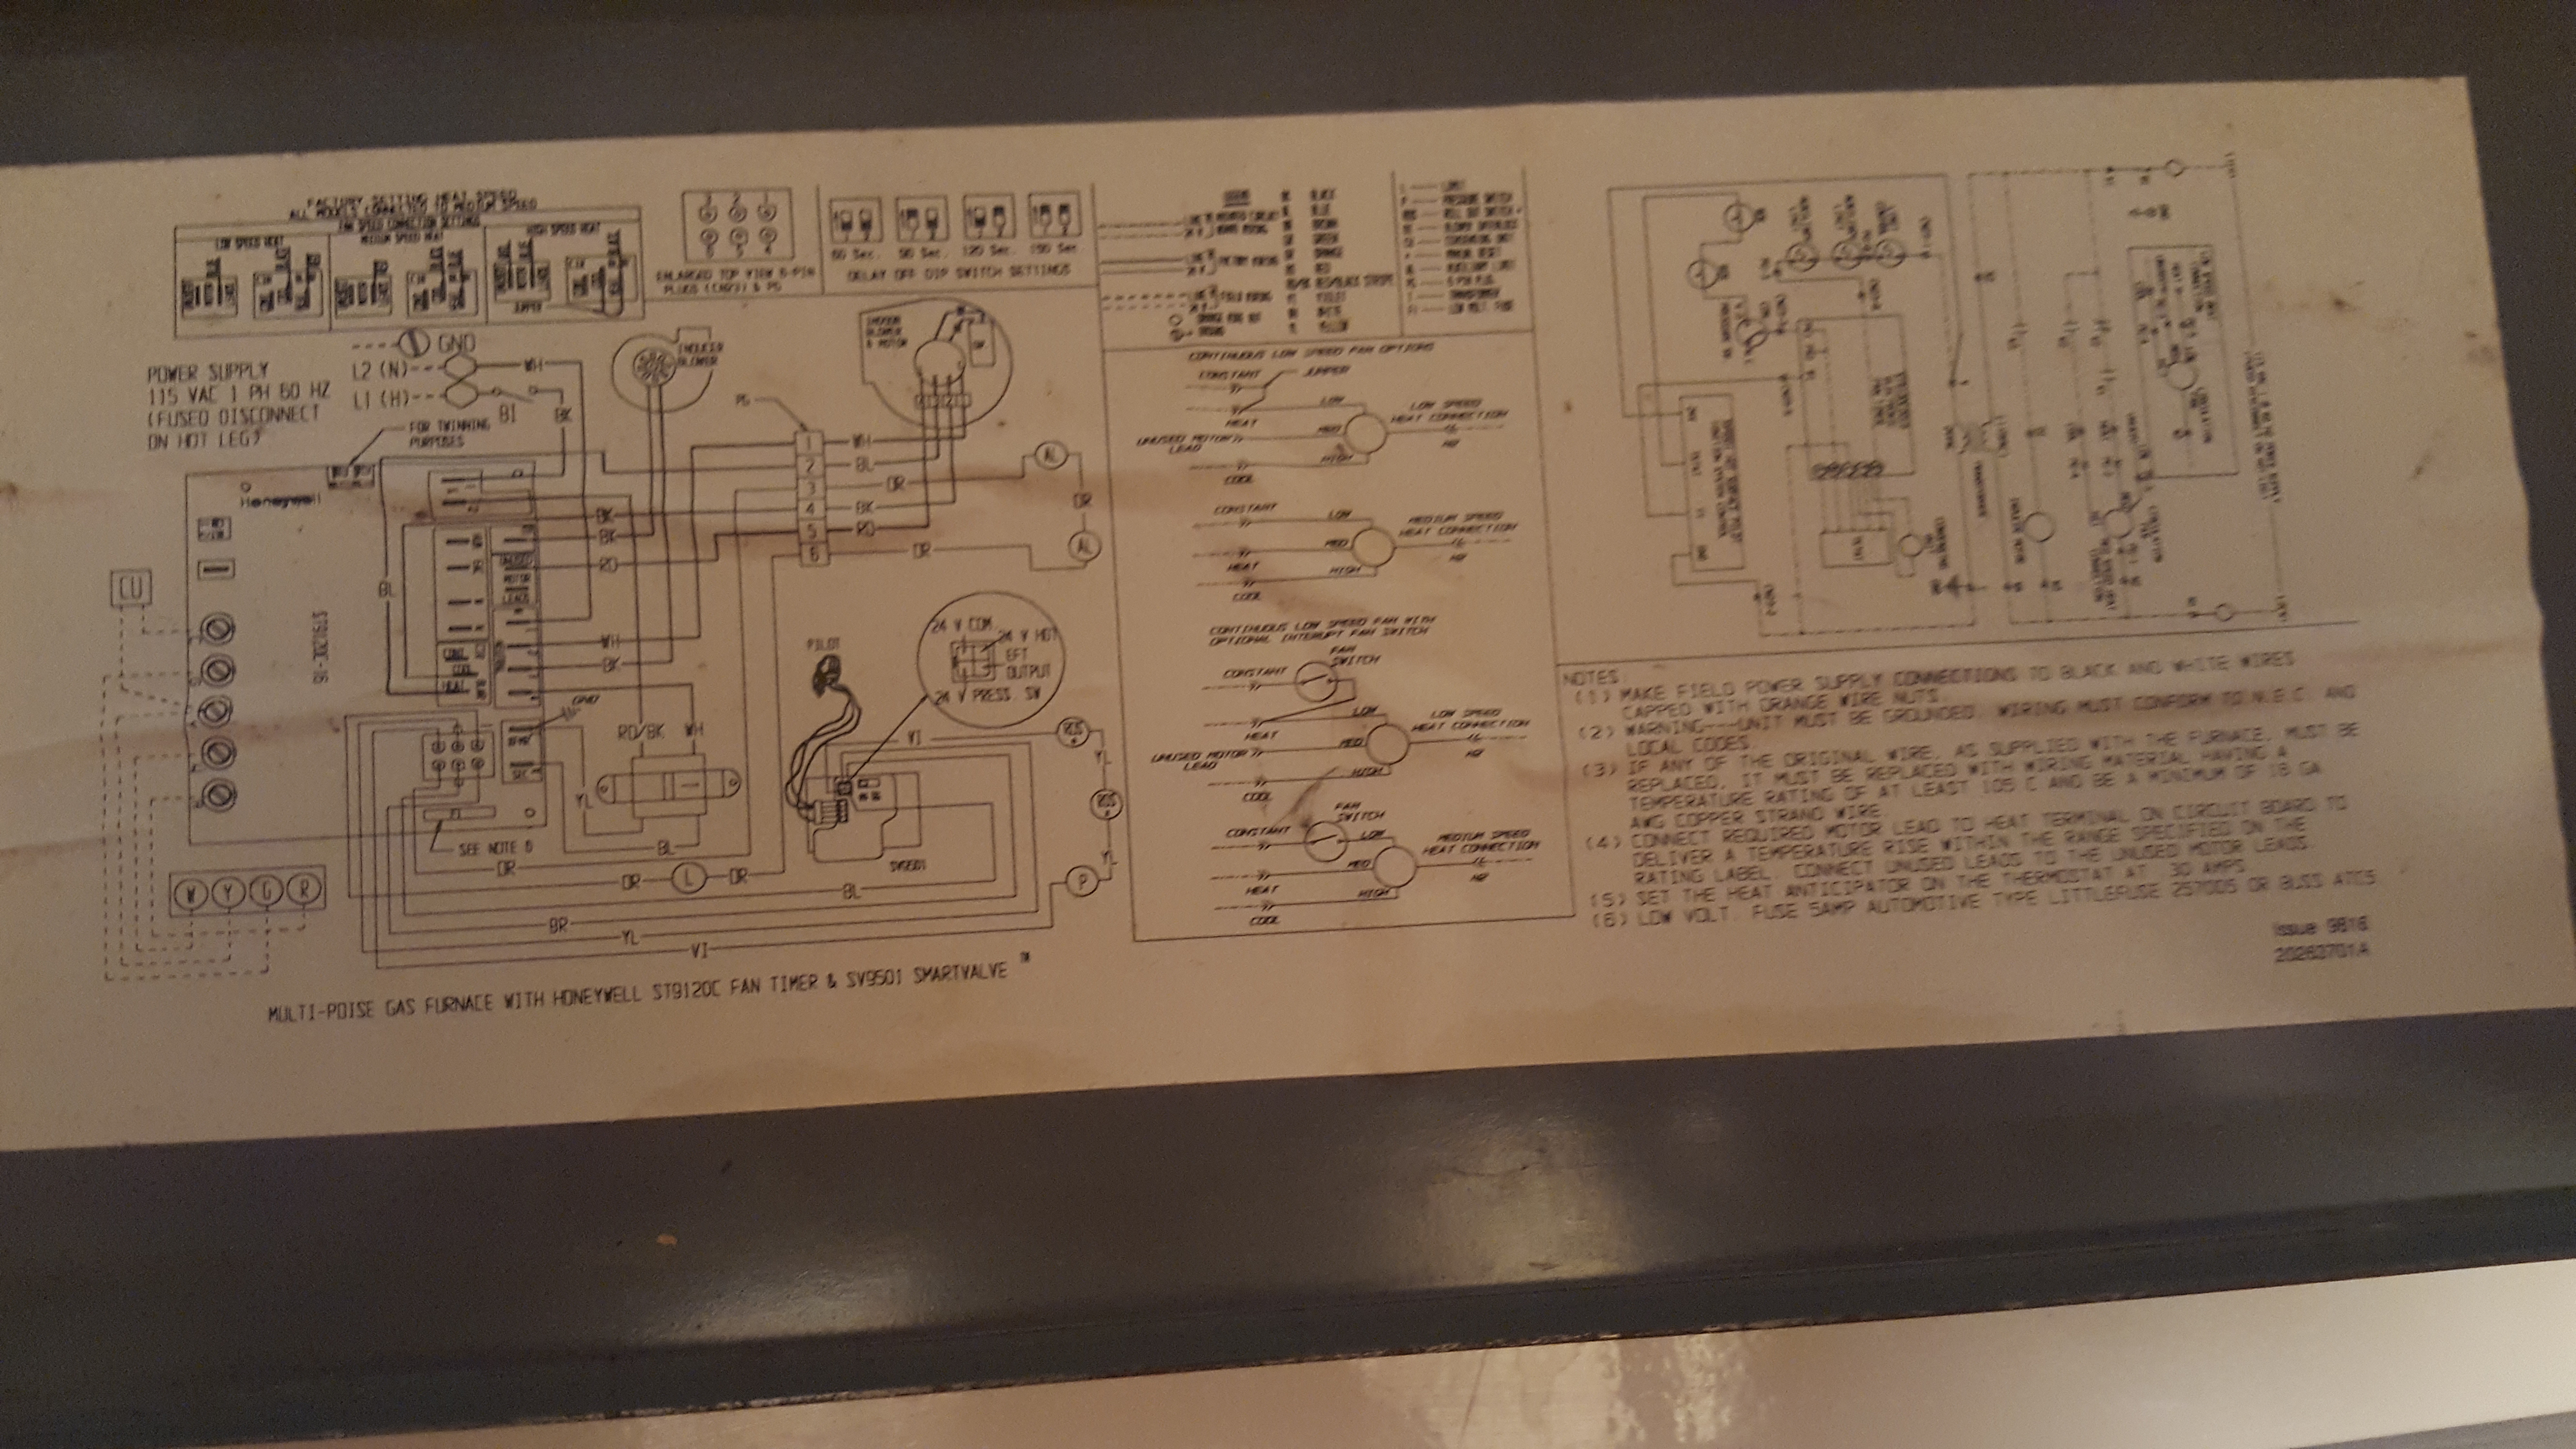 20170909_214315 ducane ac10b36 b wiring diagram on ducane download wirning diagrams  at crackthecode.co